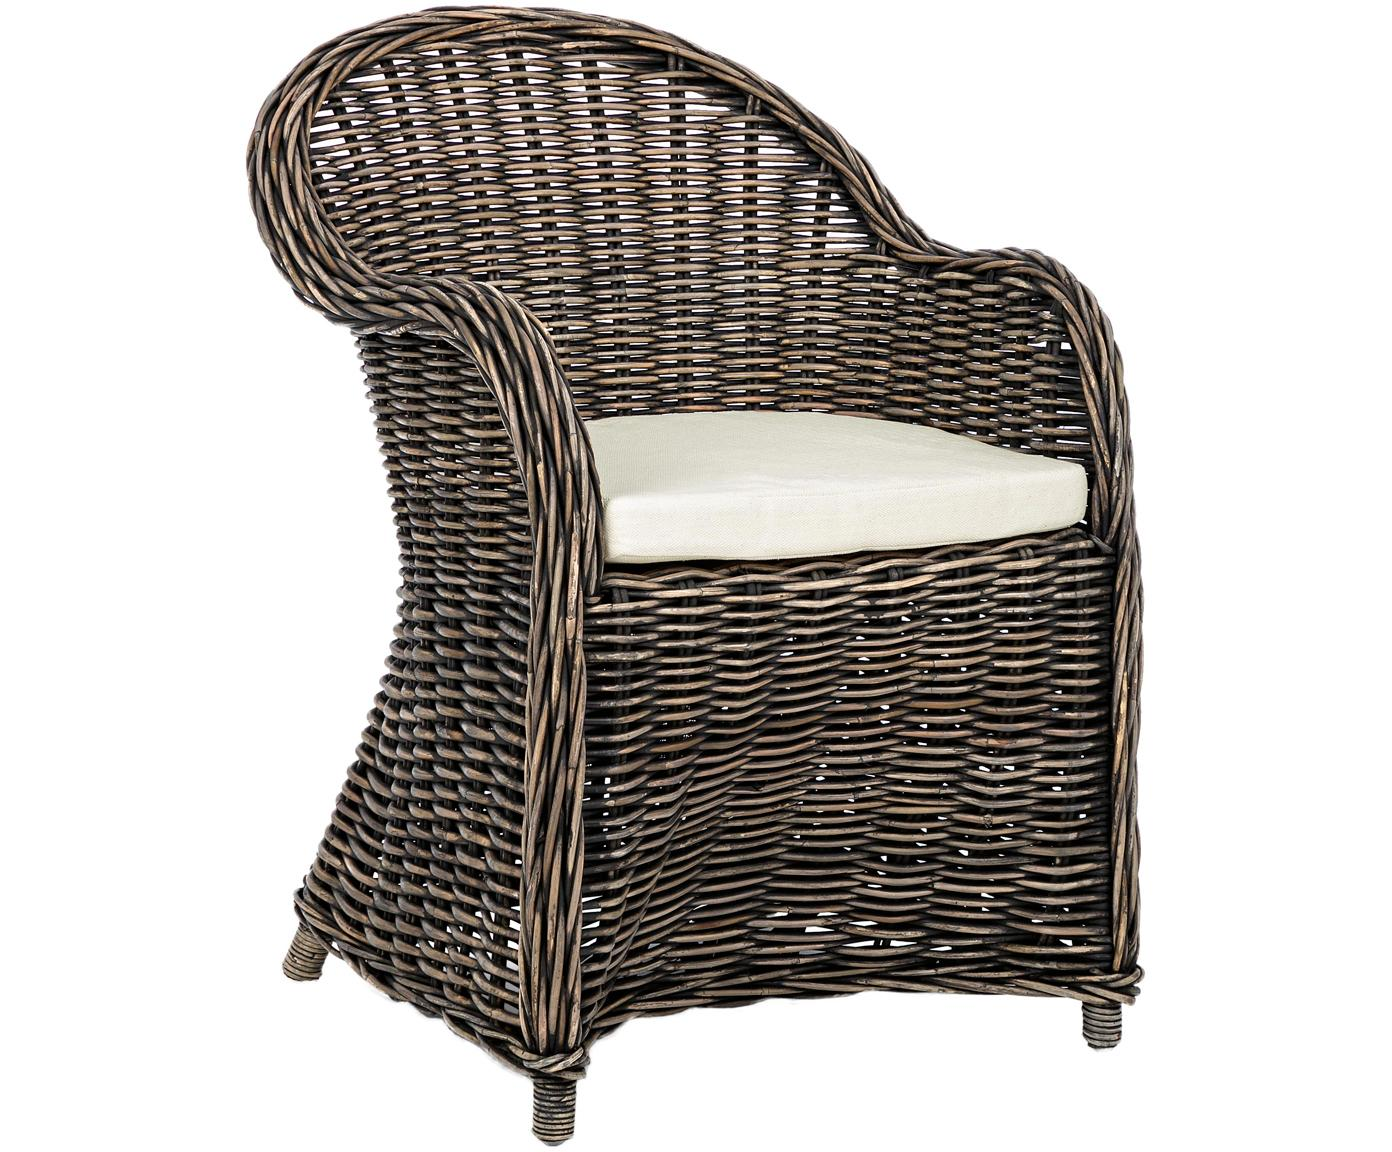 Loungefauteuil Martin, Bekleding: katoen, Rotan, zwart, wit, 60 x 89 cm